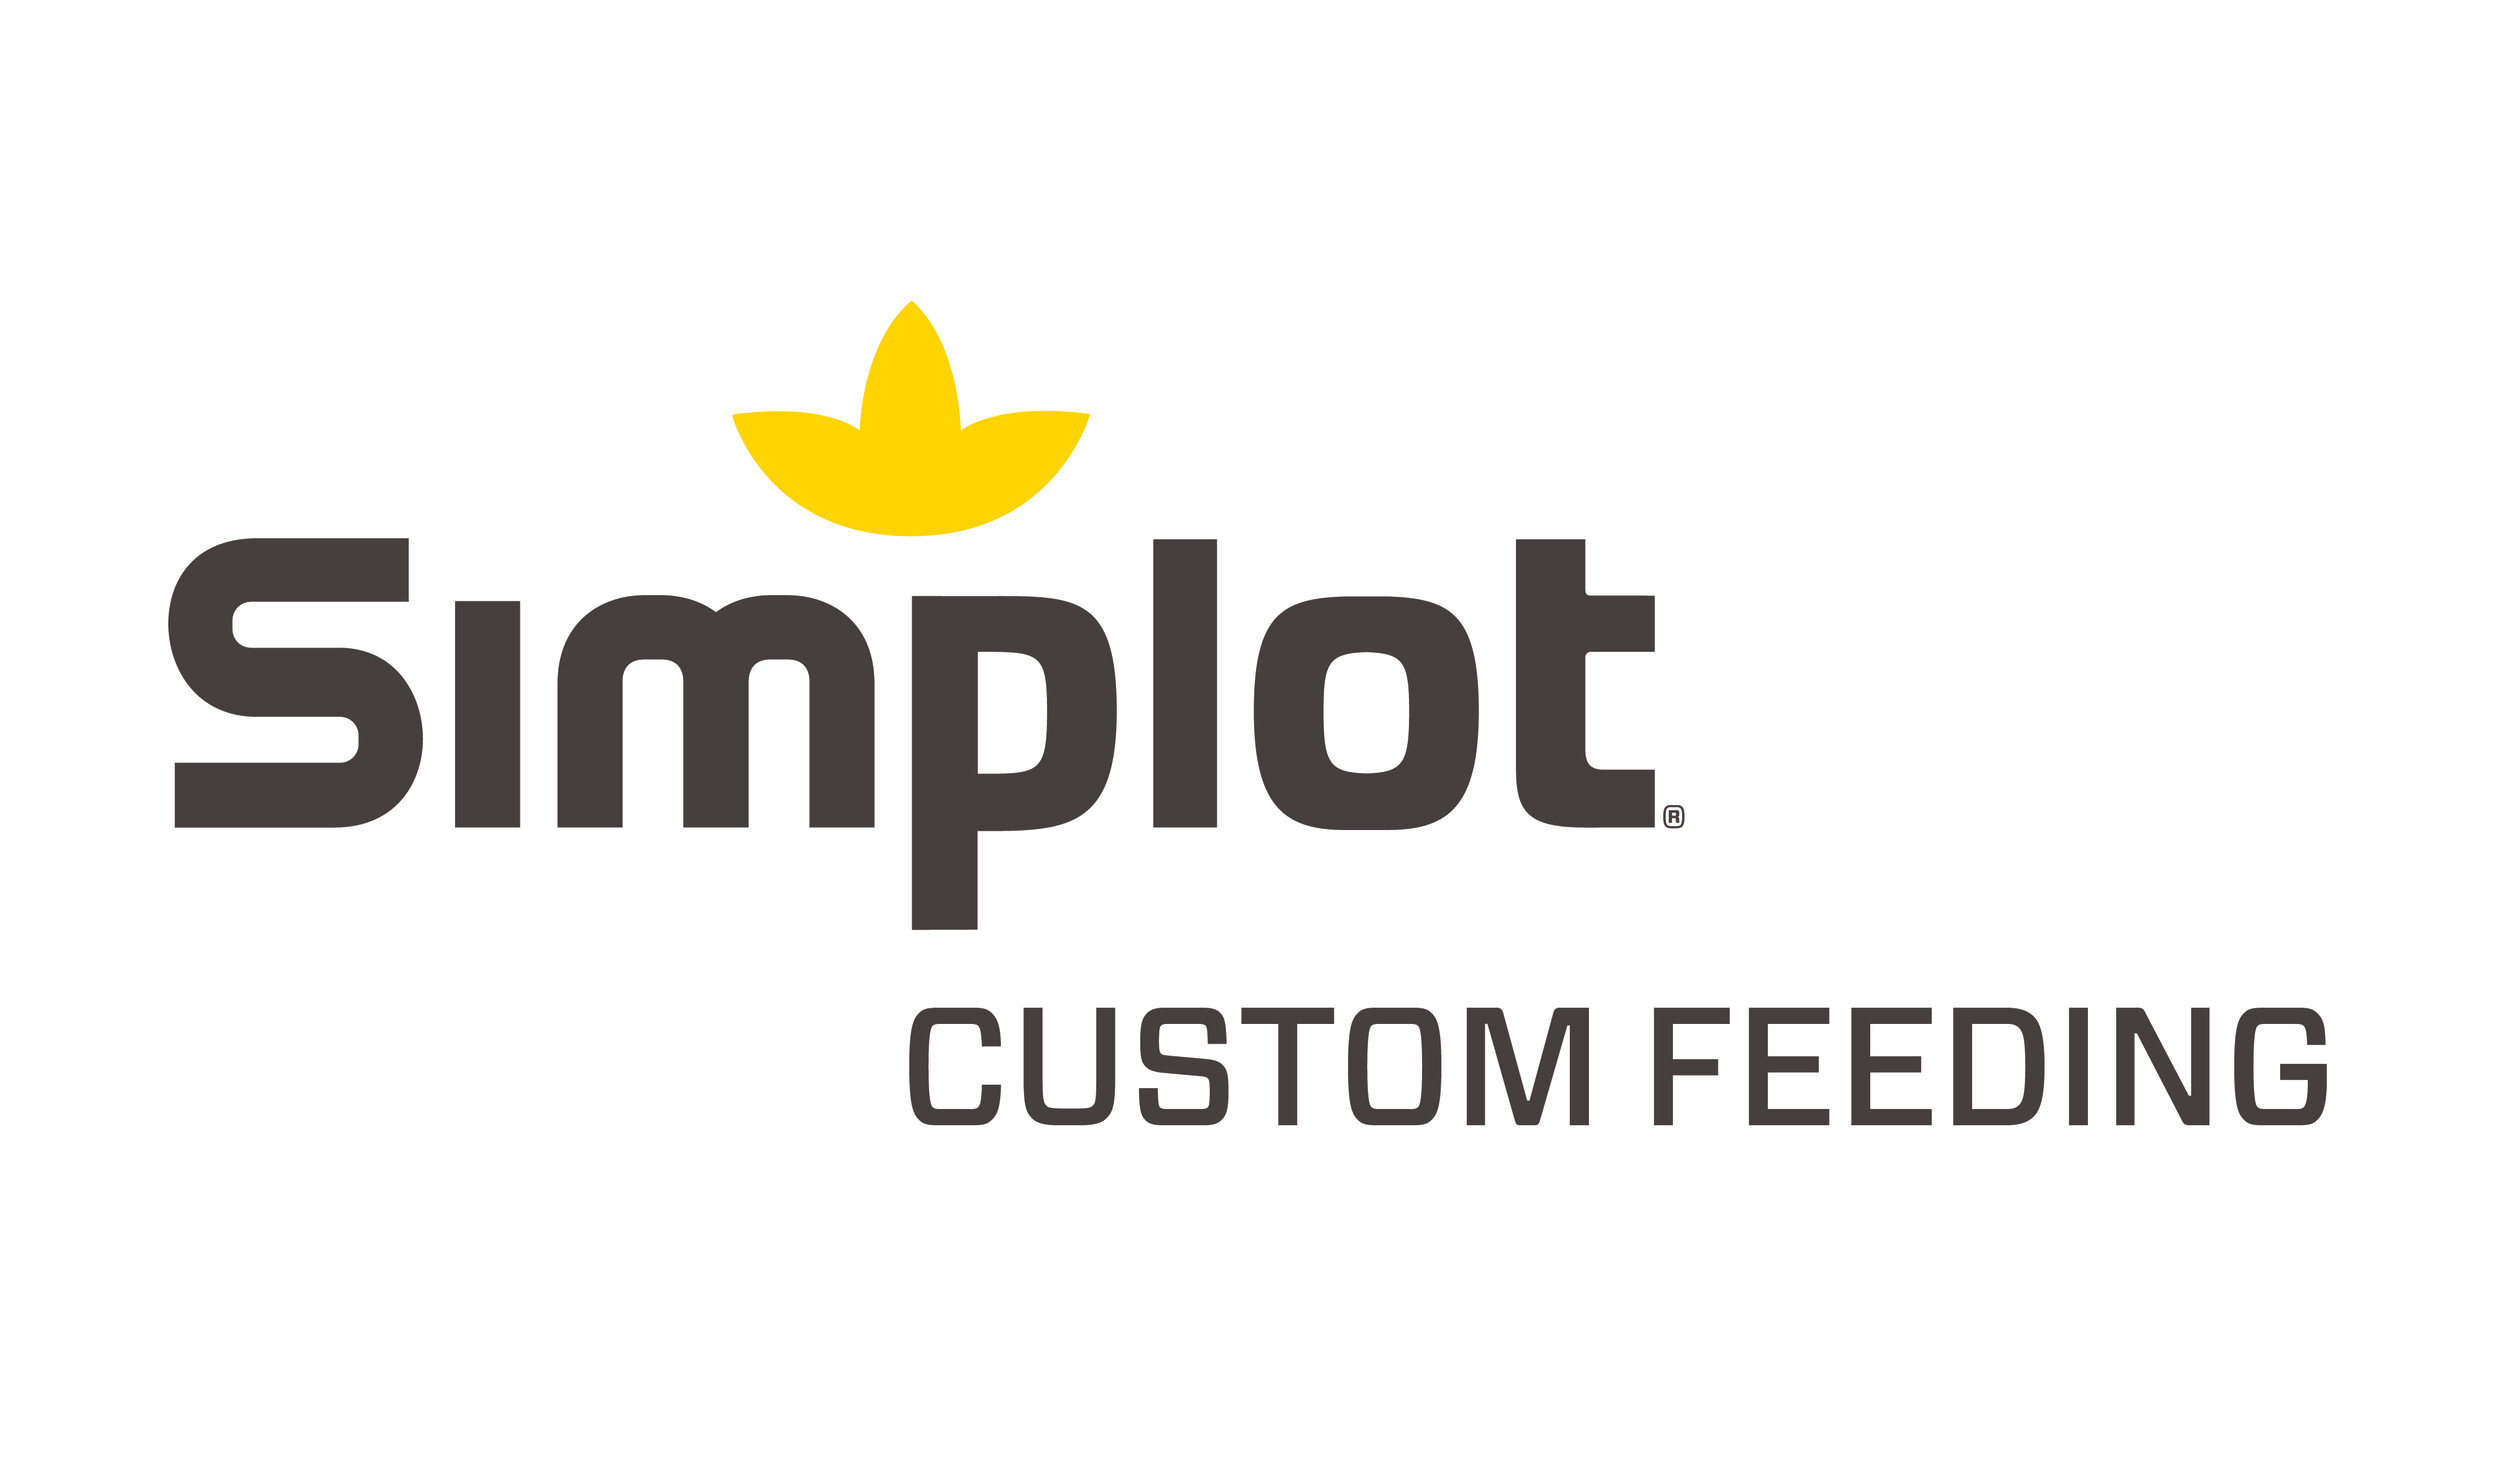 Simplot_Custom_Feeding CMYK FlatColor (1).jpg